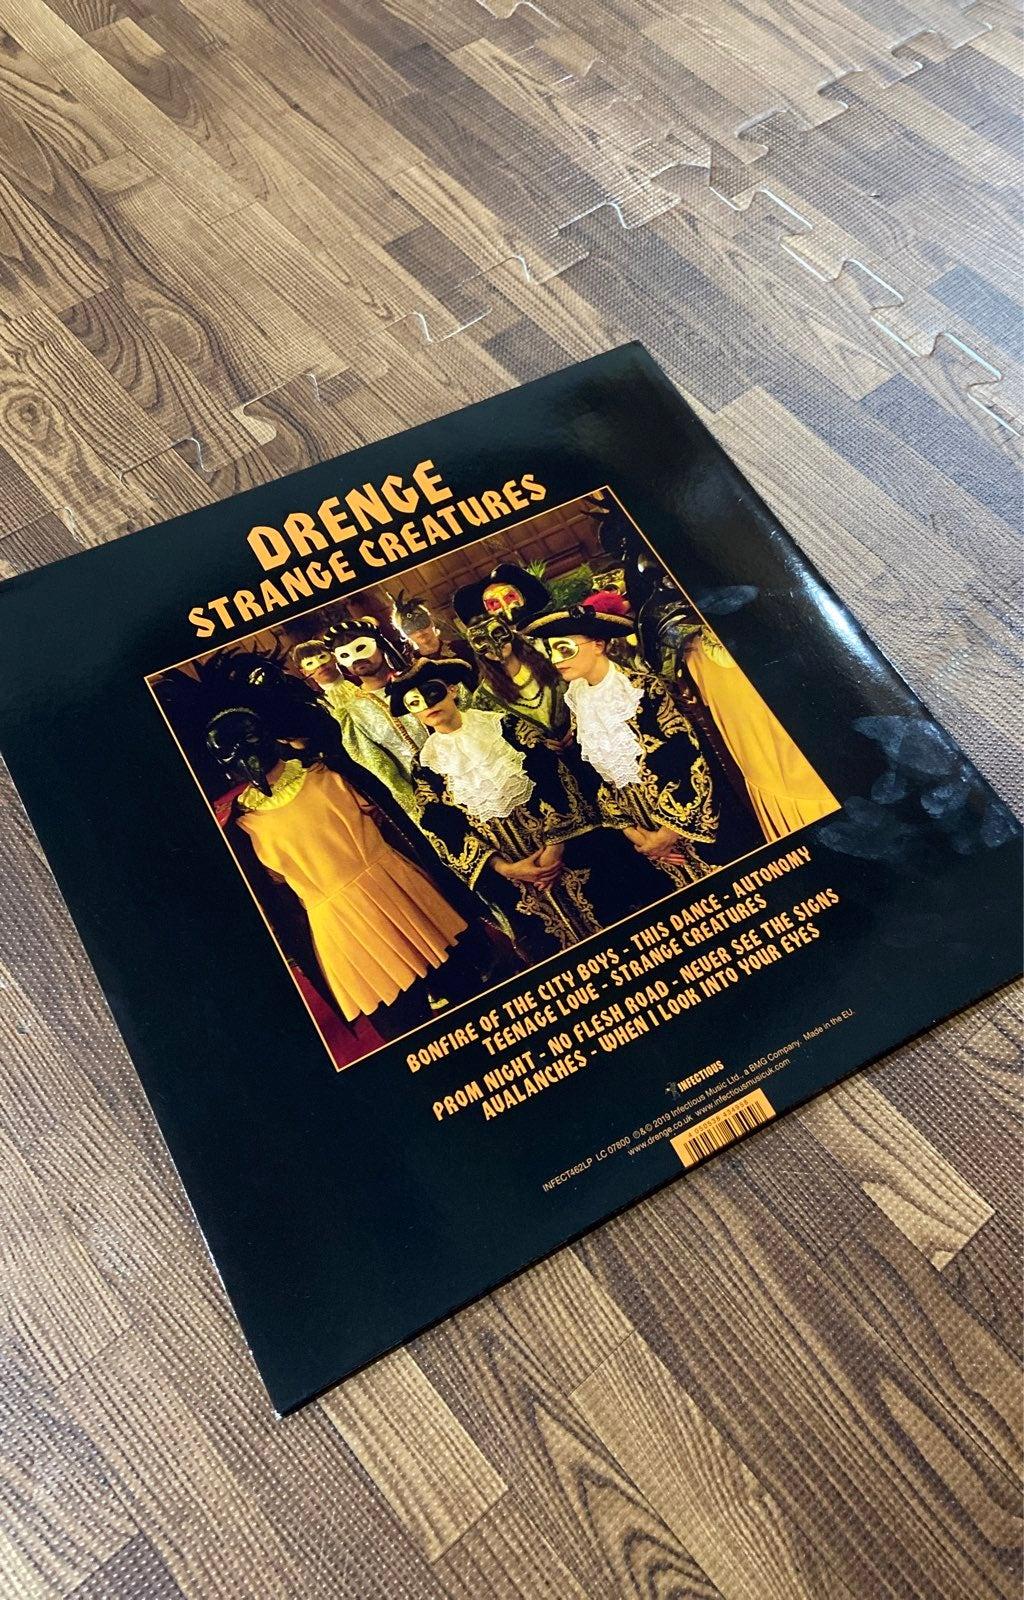 Drenge Strange Creatures Vinyl